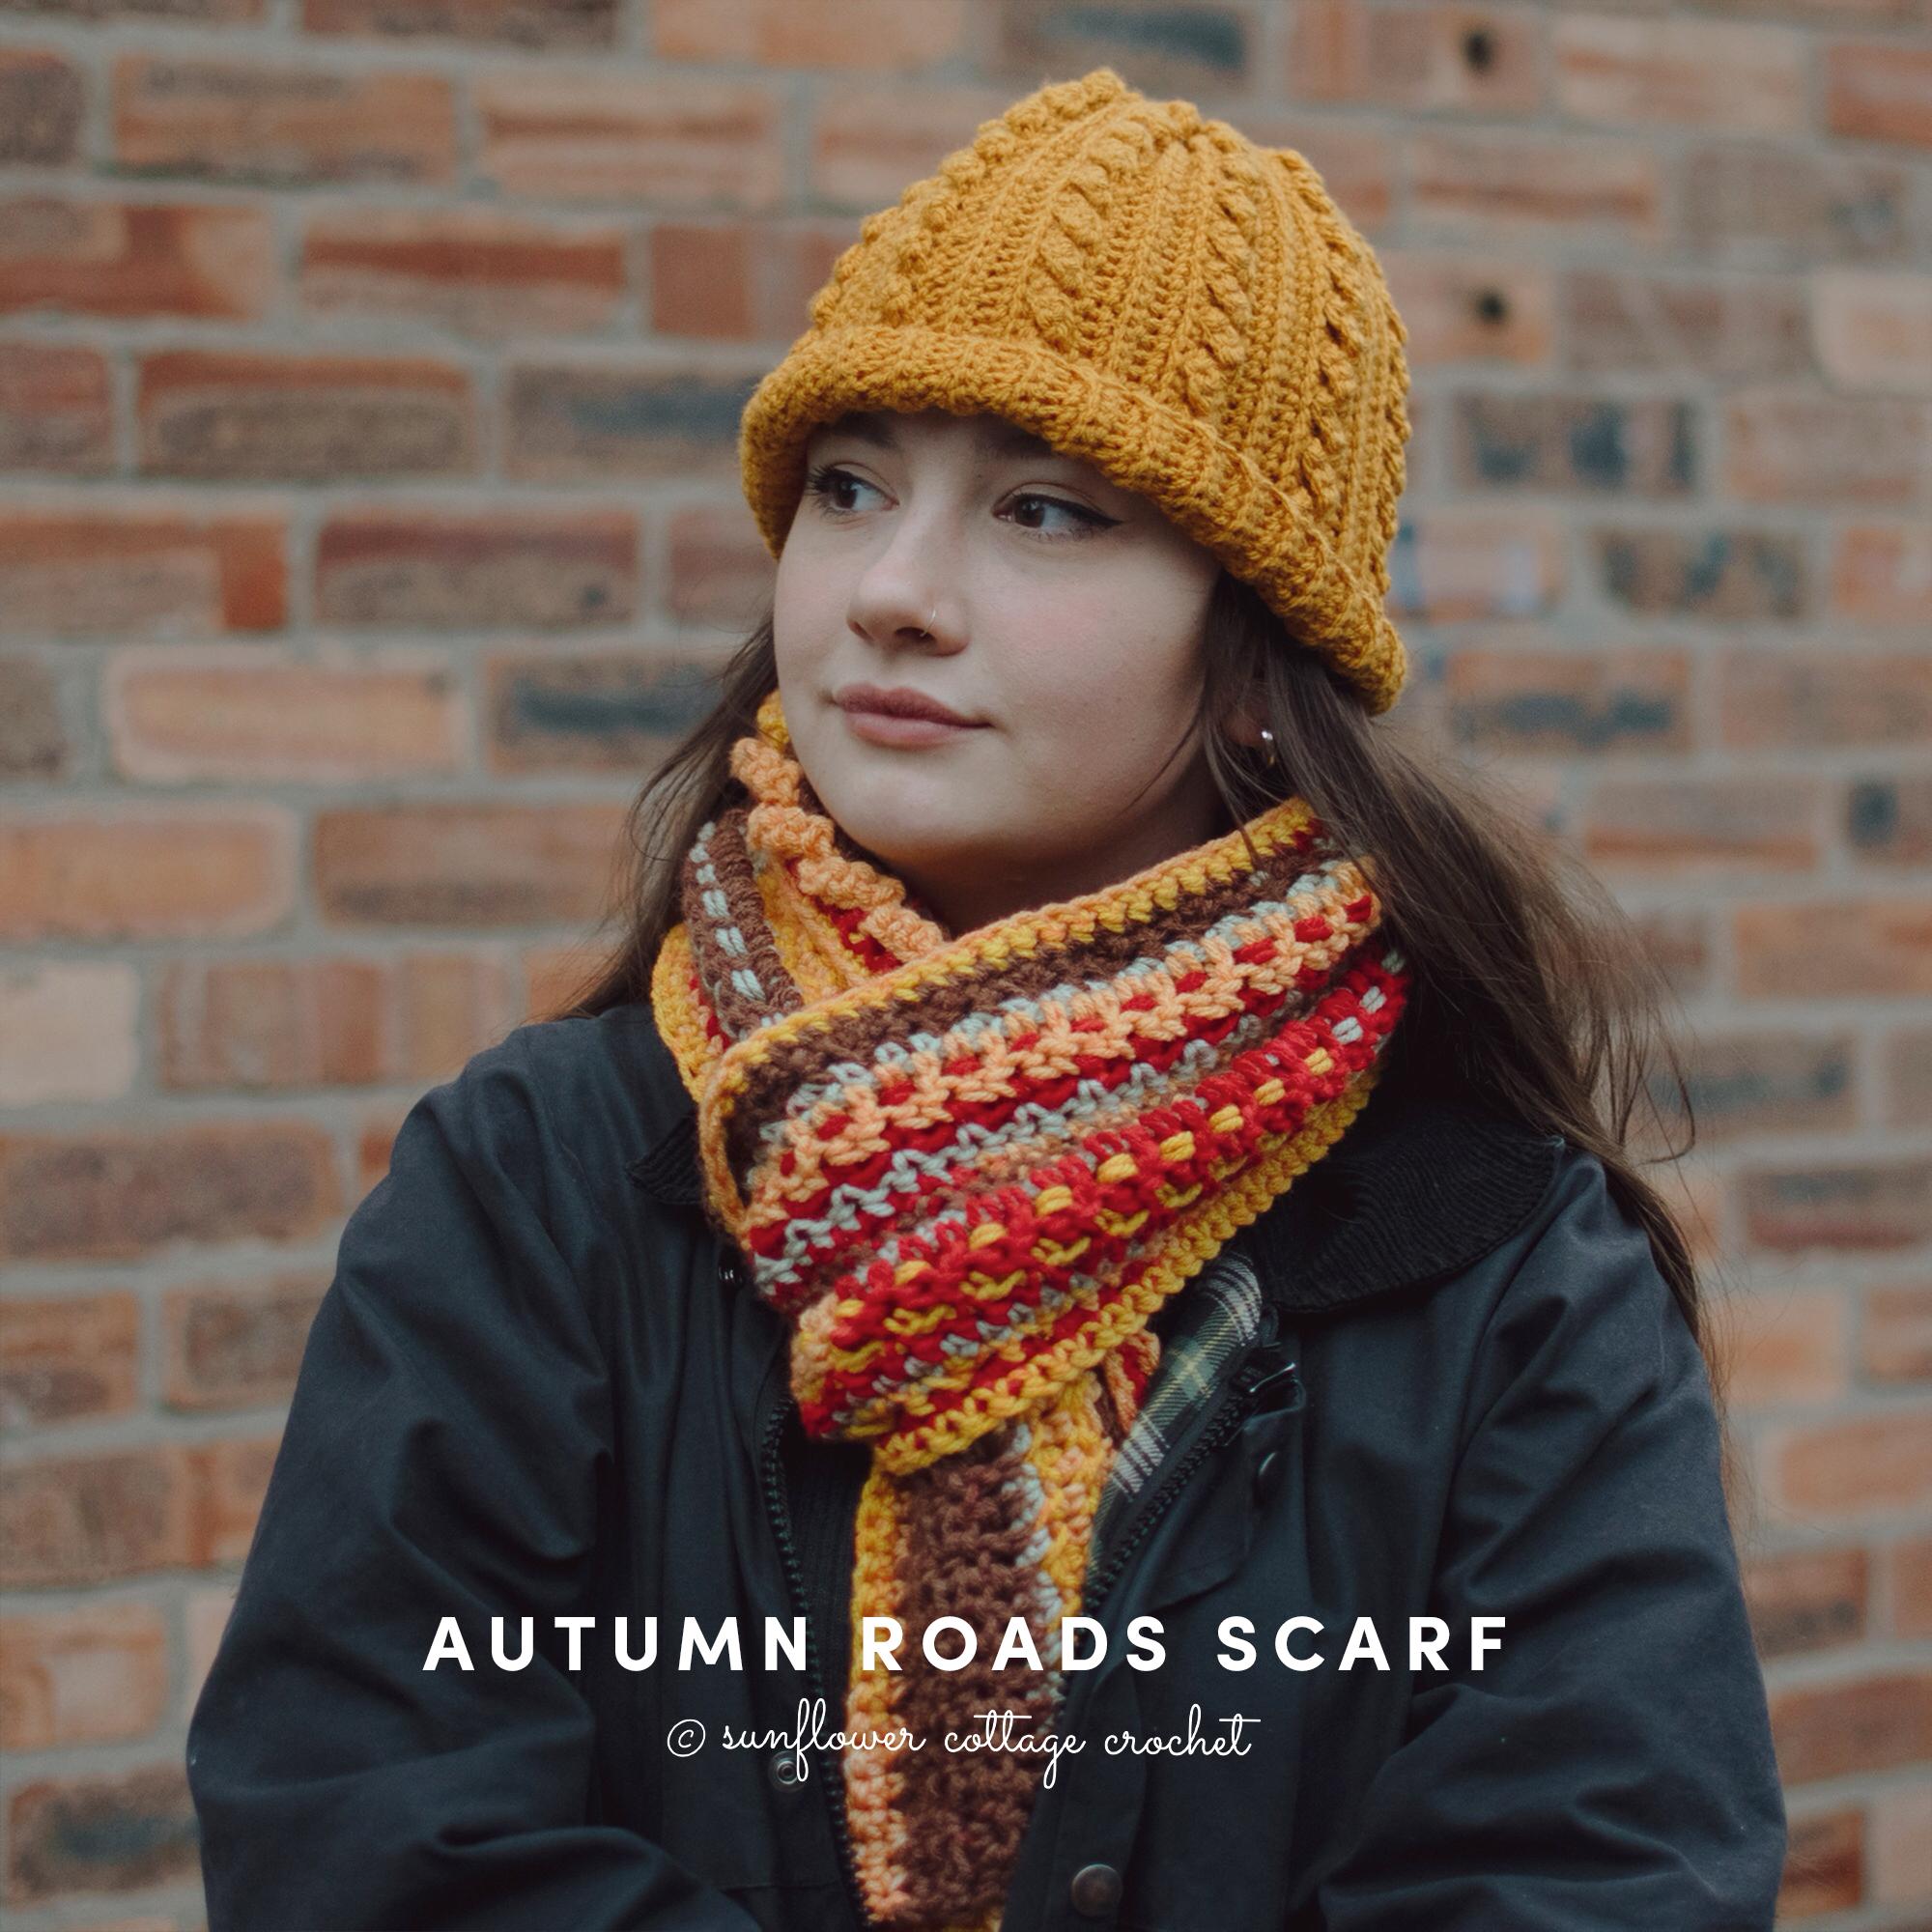 Autumn Roads Scarf